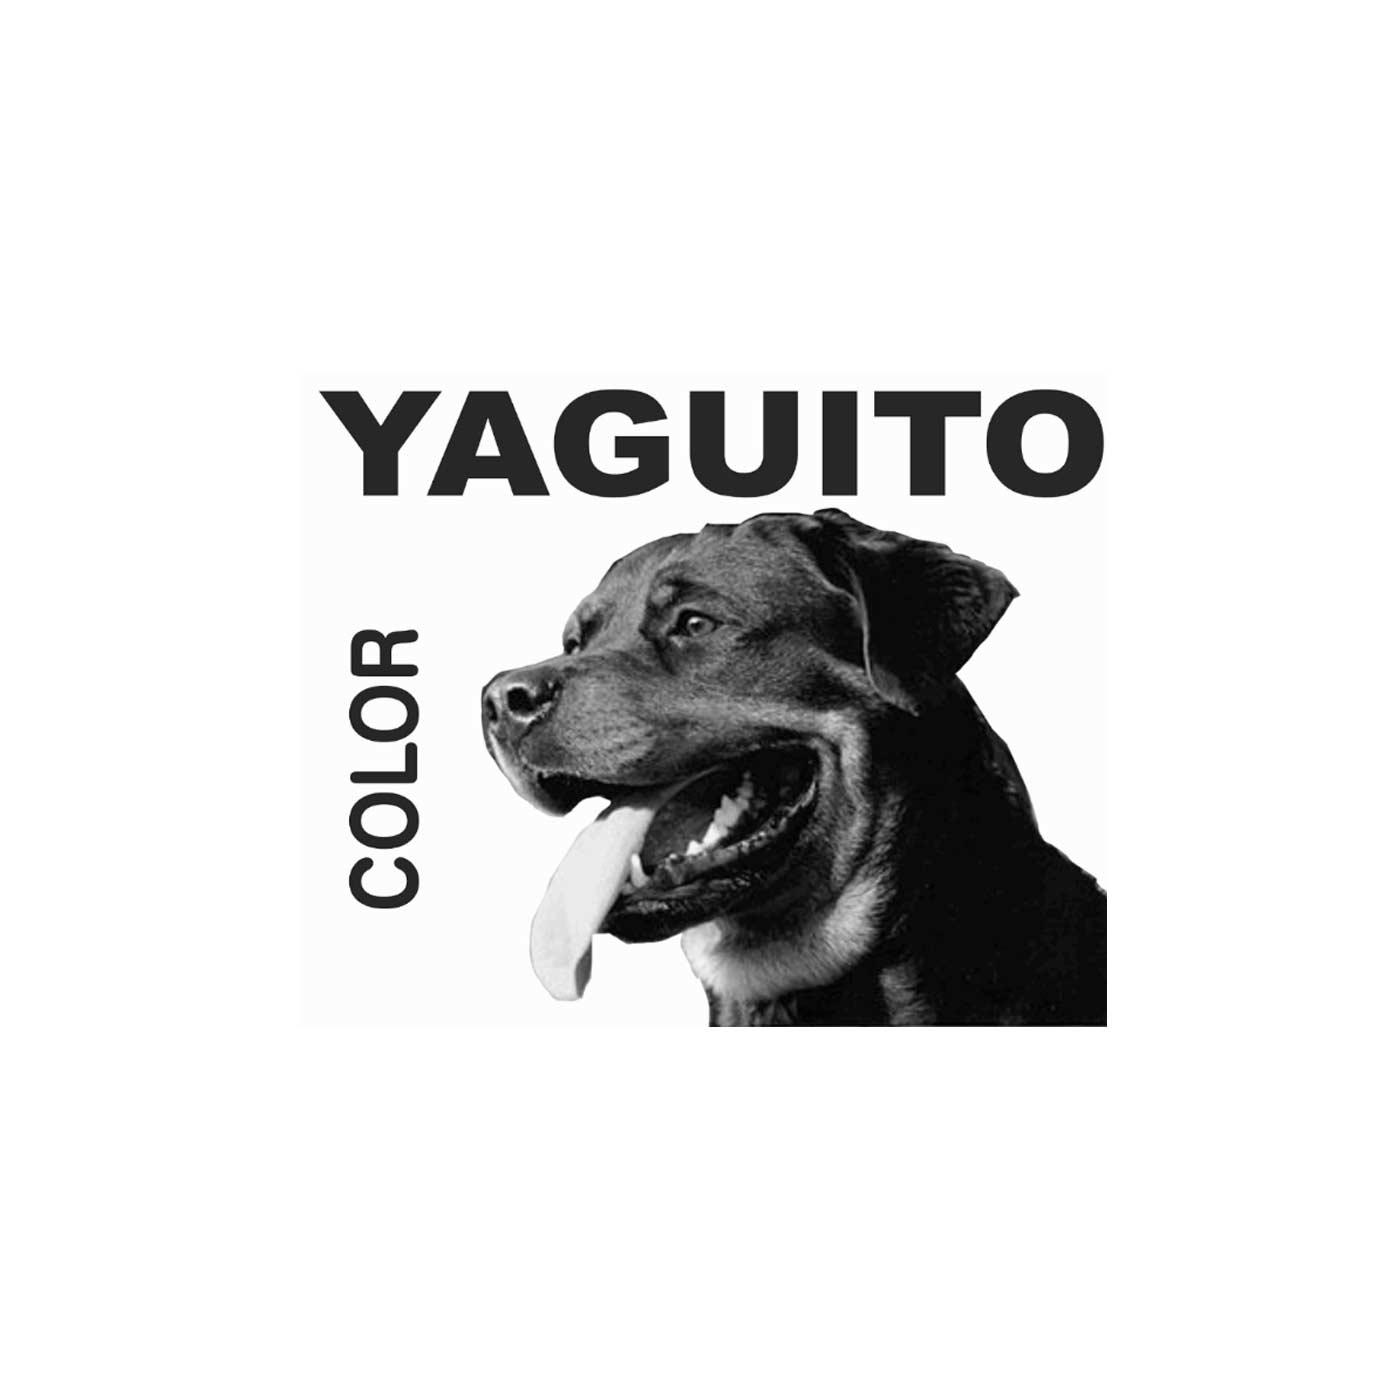 Bolsa camiseta Línea Yaguito